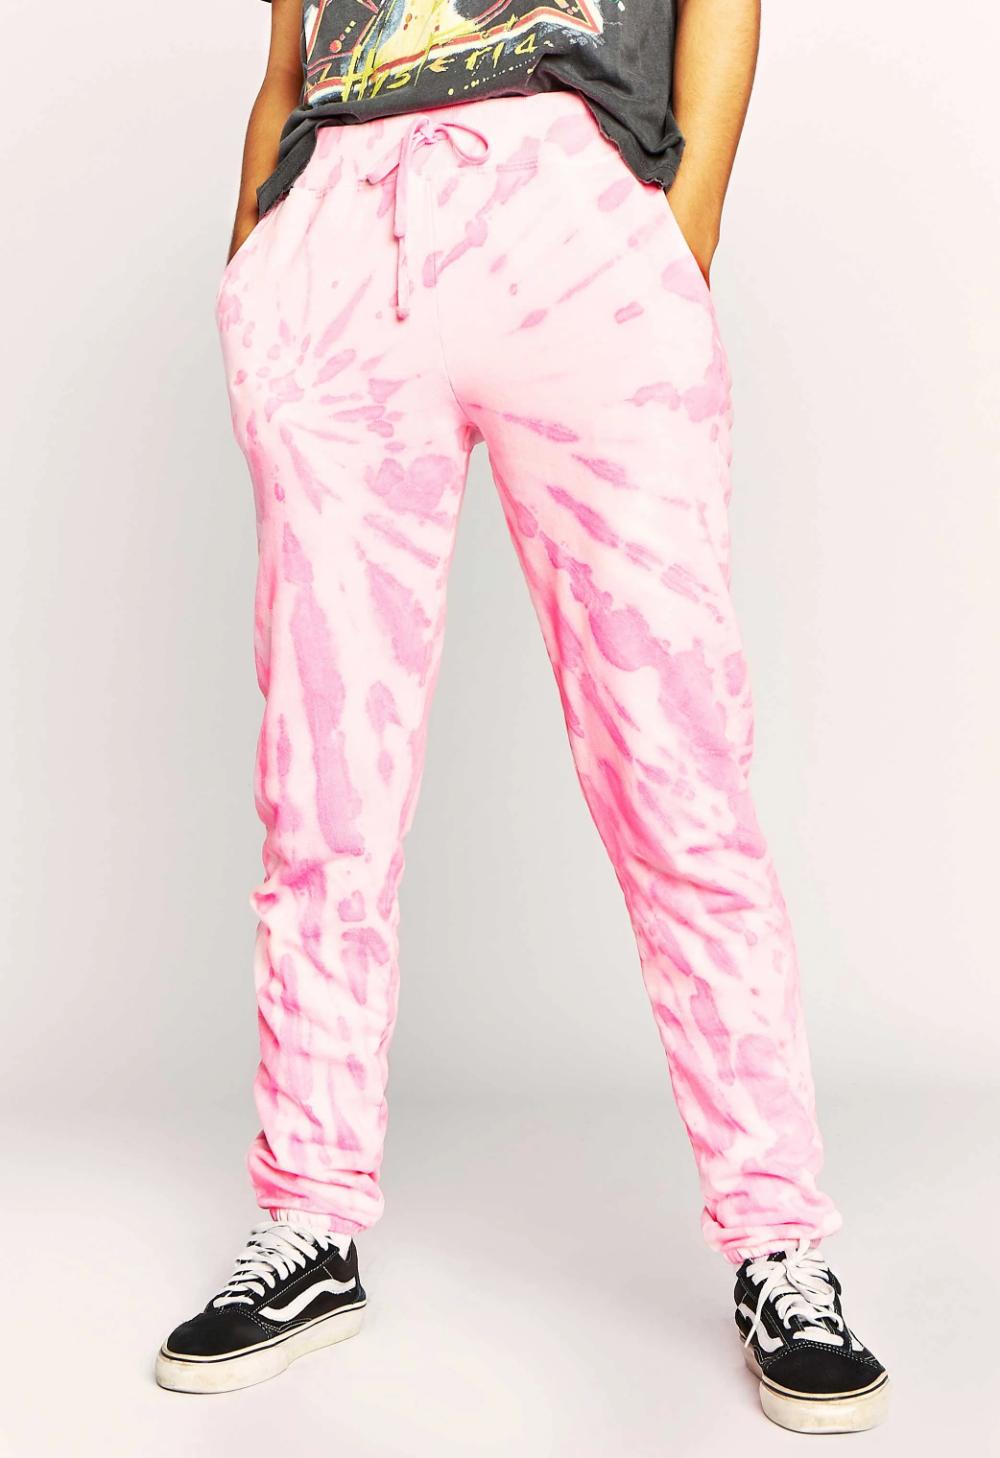 Tie Dye Jogger Sweatpant In Pink Daydreamer Sweatpants Tie Dye Pink Tye Dye